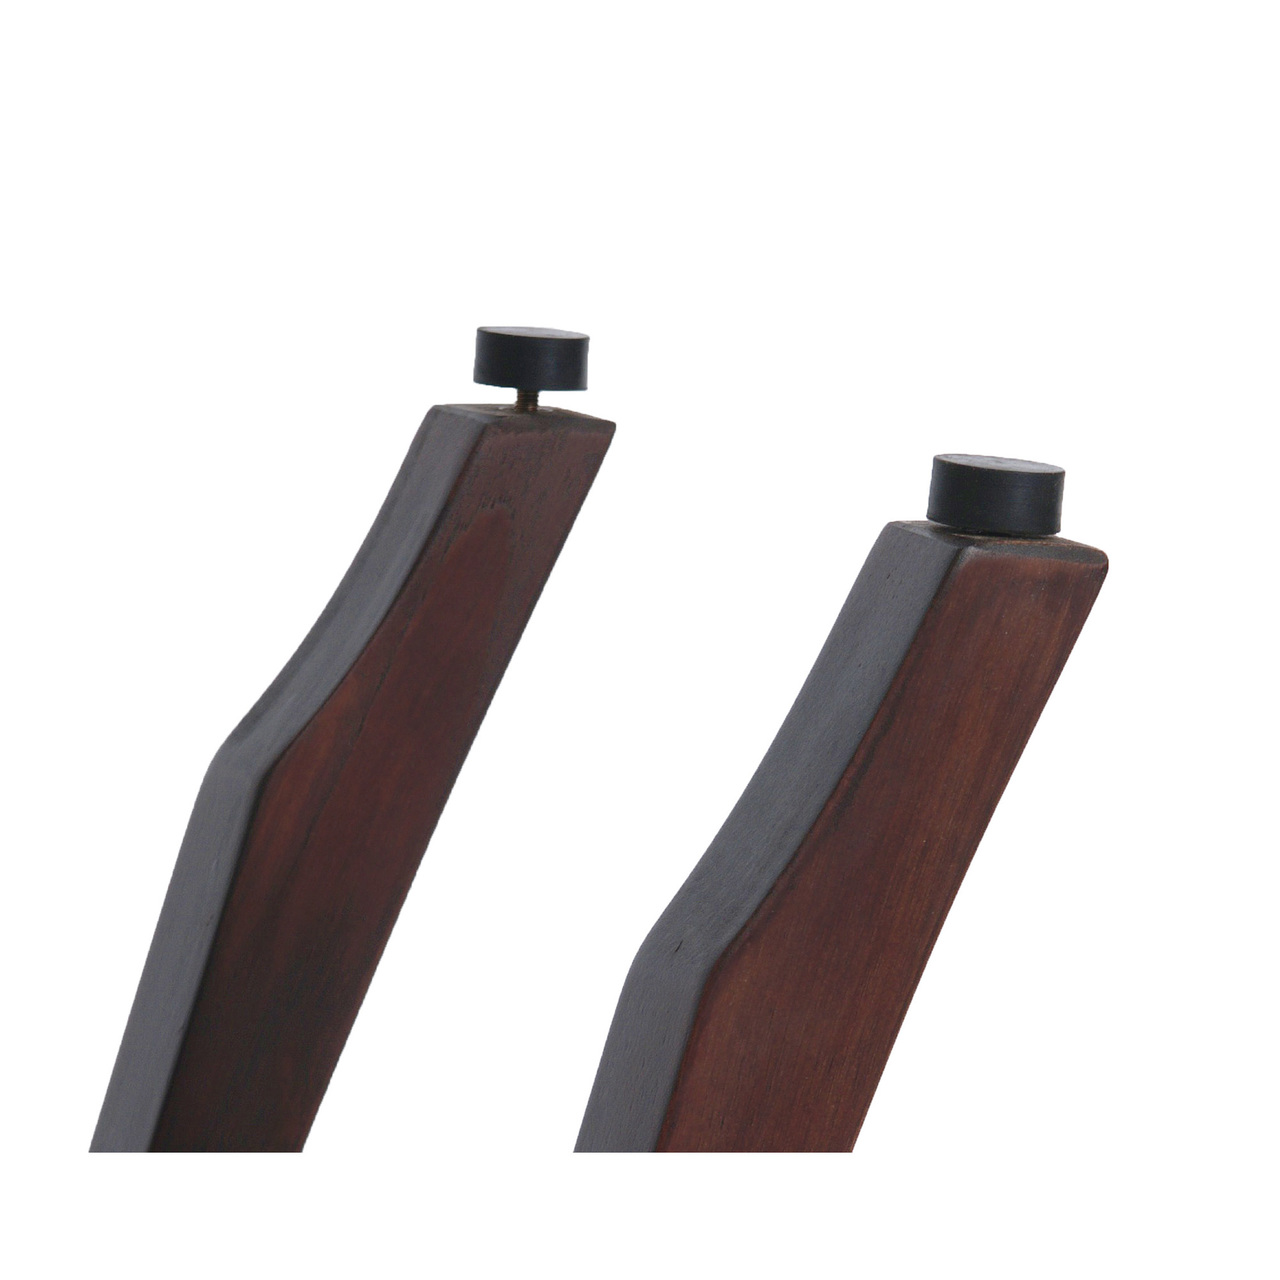 Decoteak Satori 34 Inch Teak Shower Bench With Shelf